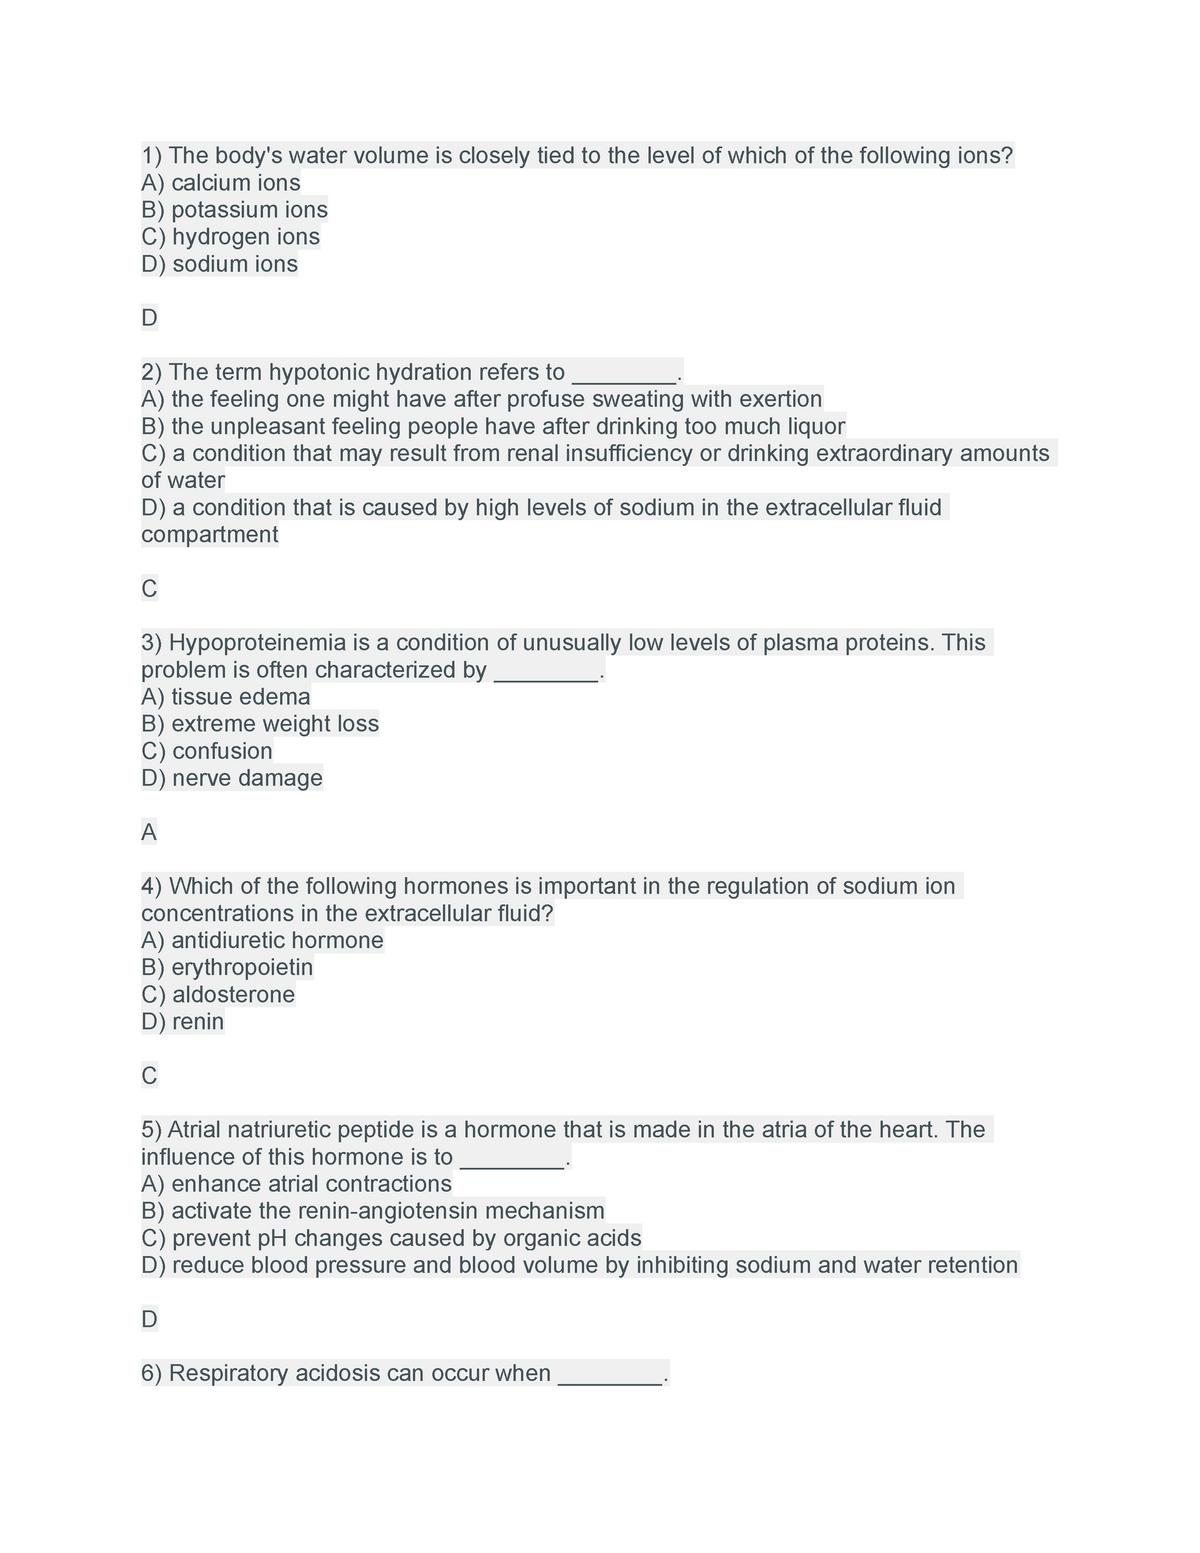 Chapter 26- Fluid, Electrolyte, and Acid-Base Balance - UVM - StuDocu